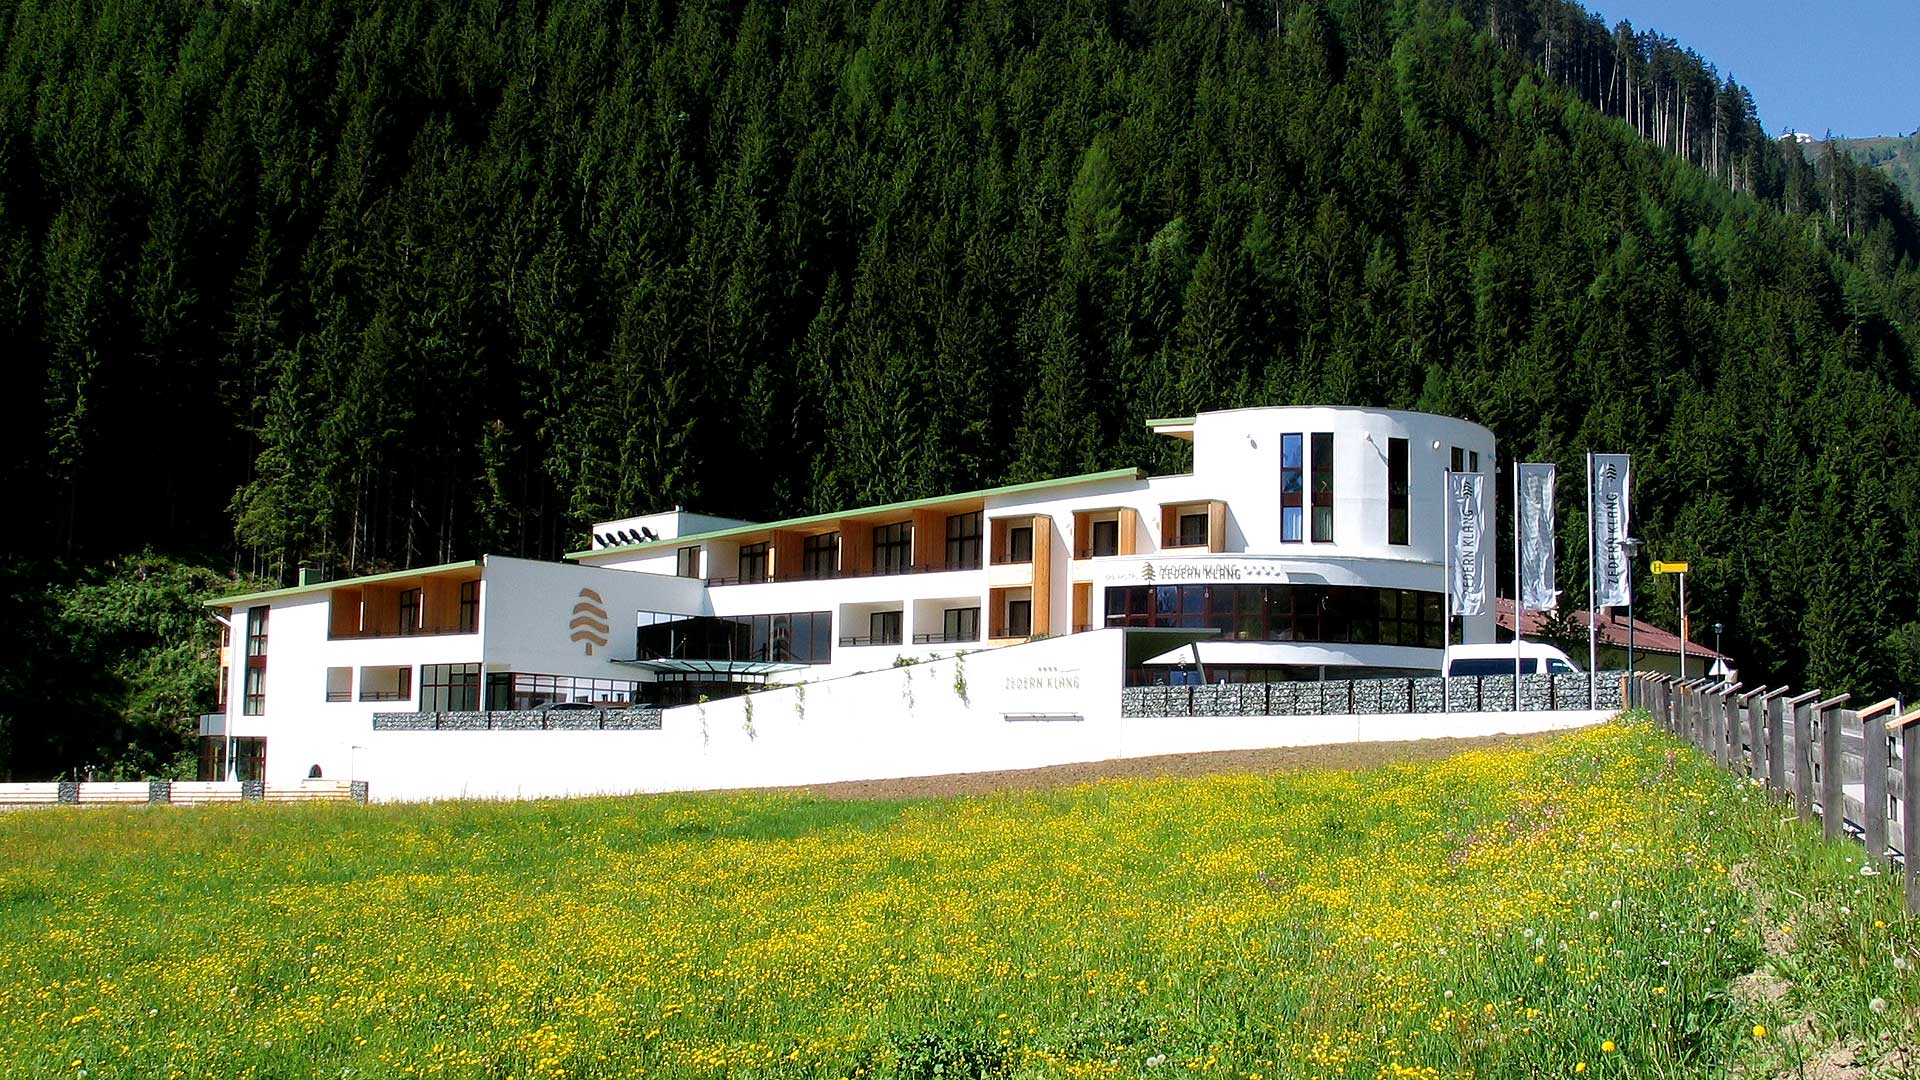 Headerbild-Hotel-Aussen-Zedern-Klang